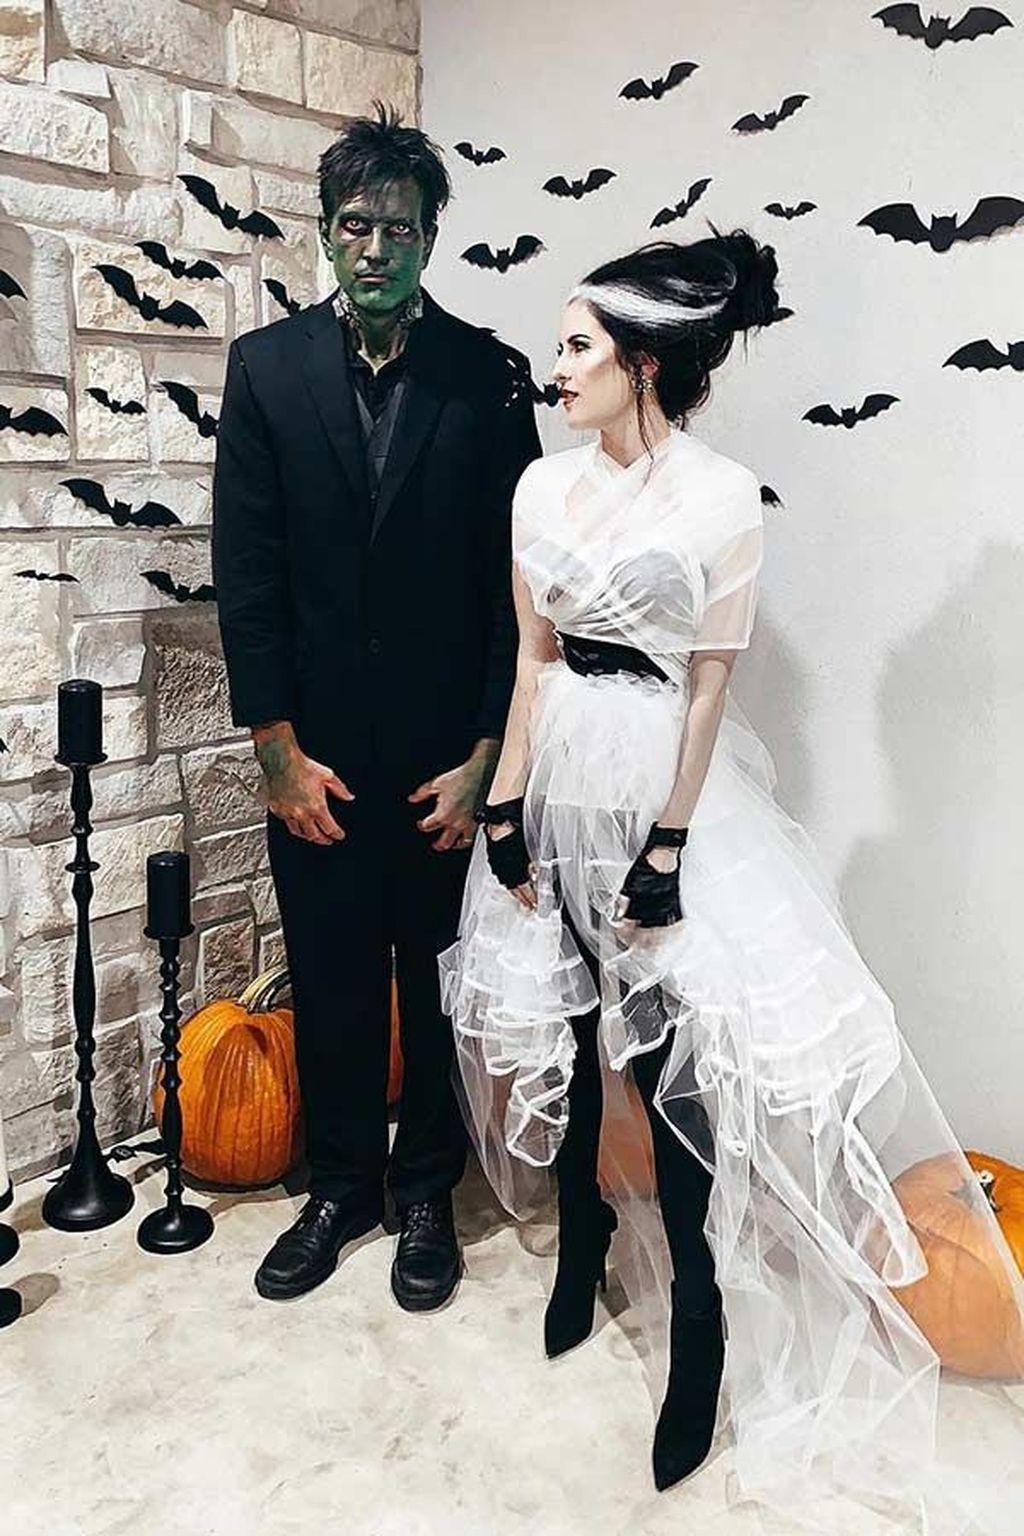 40 Awesome Couples Halloween Costumes Ideas - DRESSCODEE #coupleshalloweencostumeideas